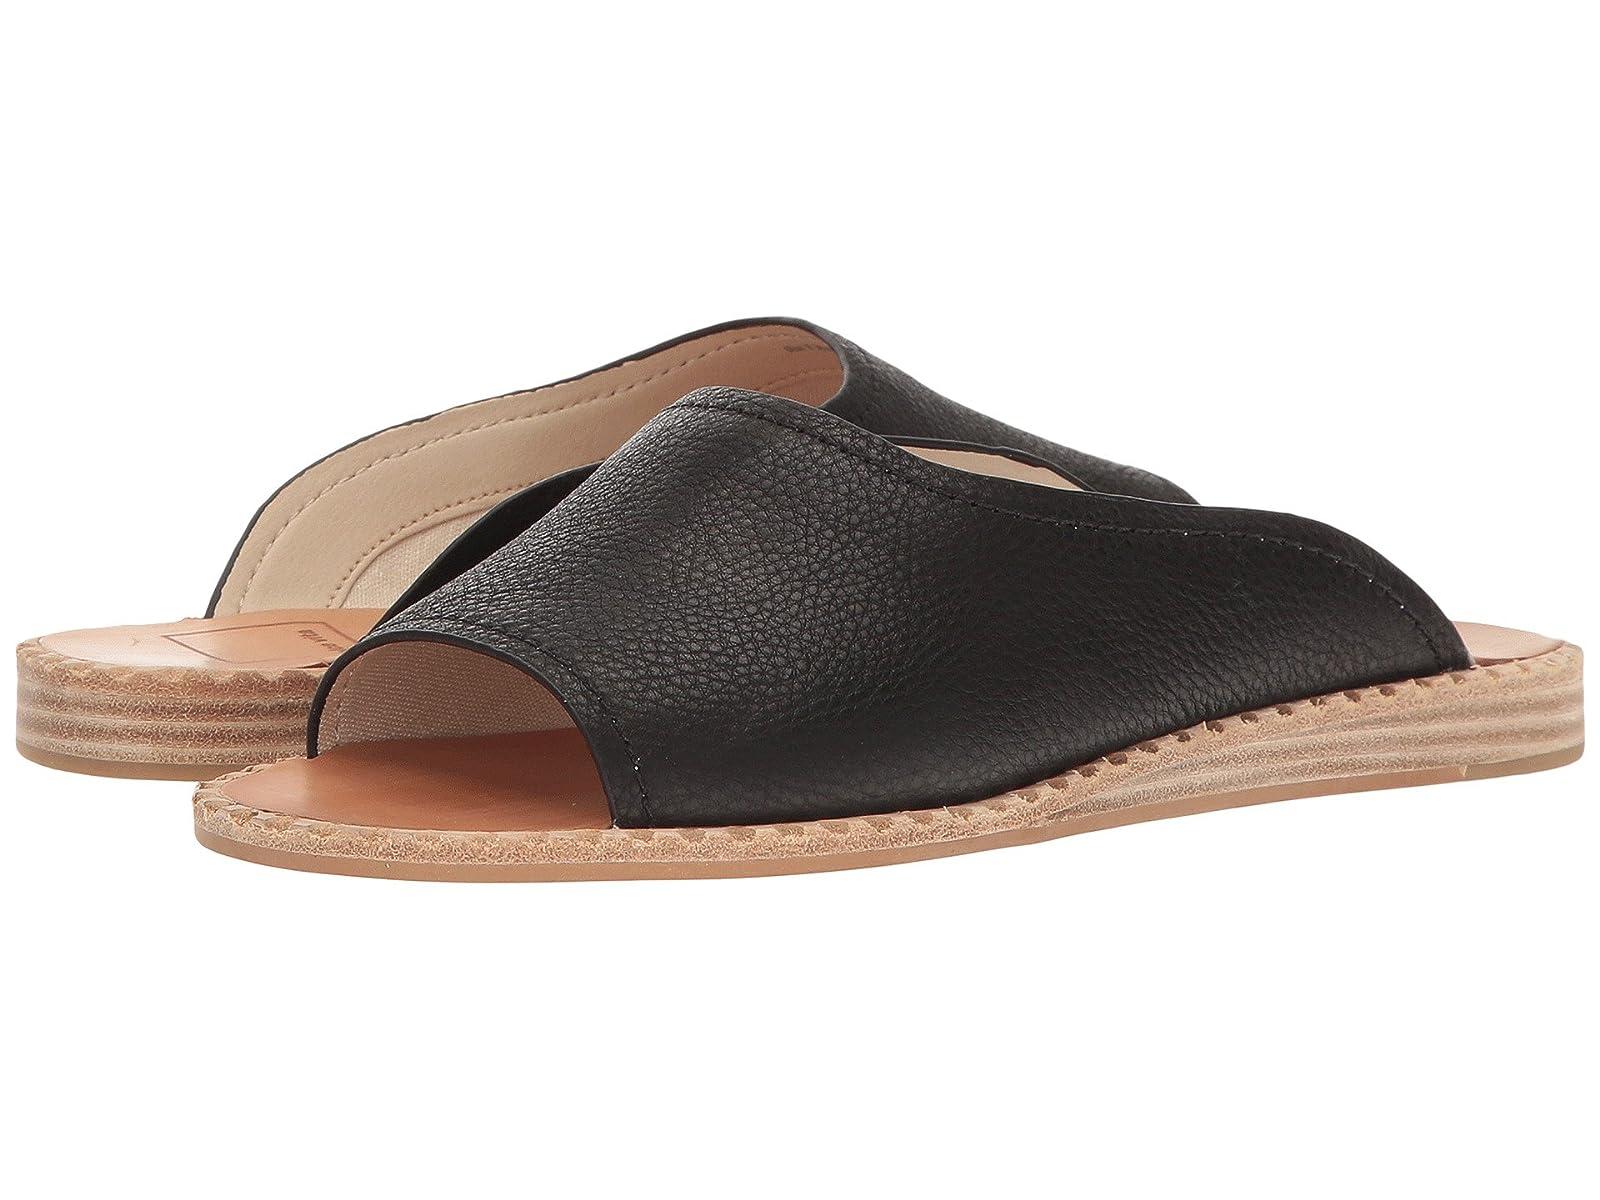 Dolce Vita PoeCheap and distinctive eye-catching shoes